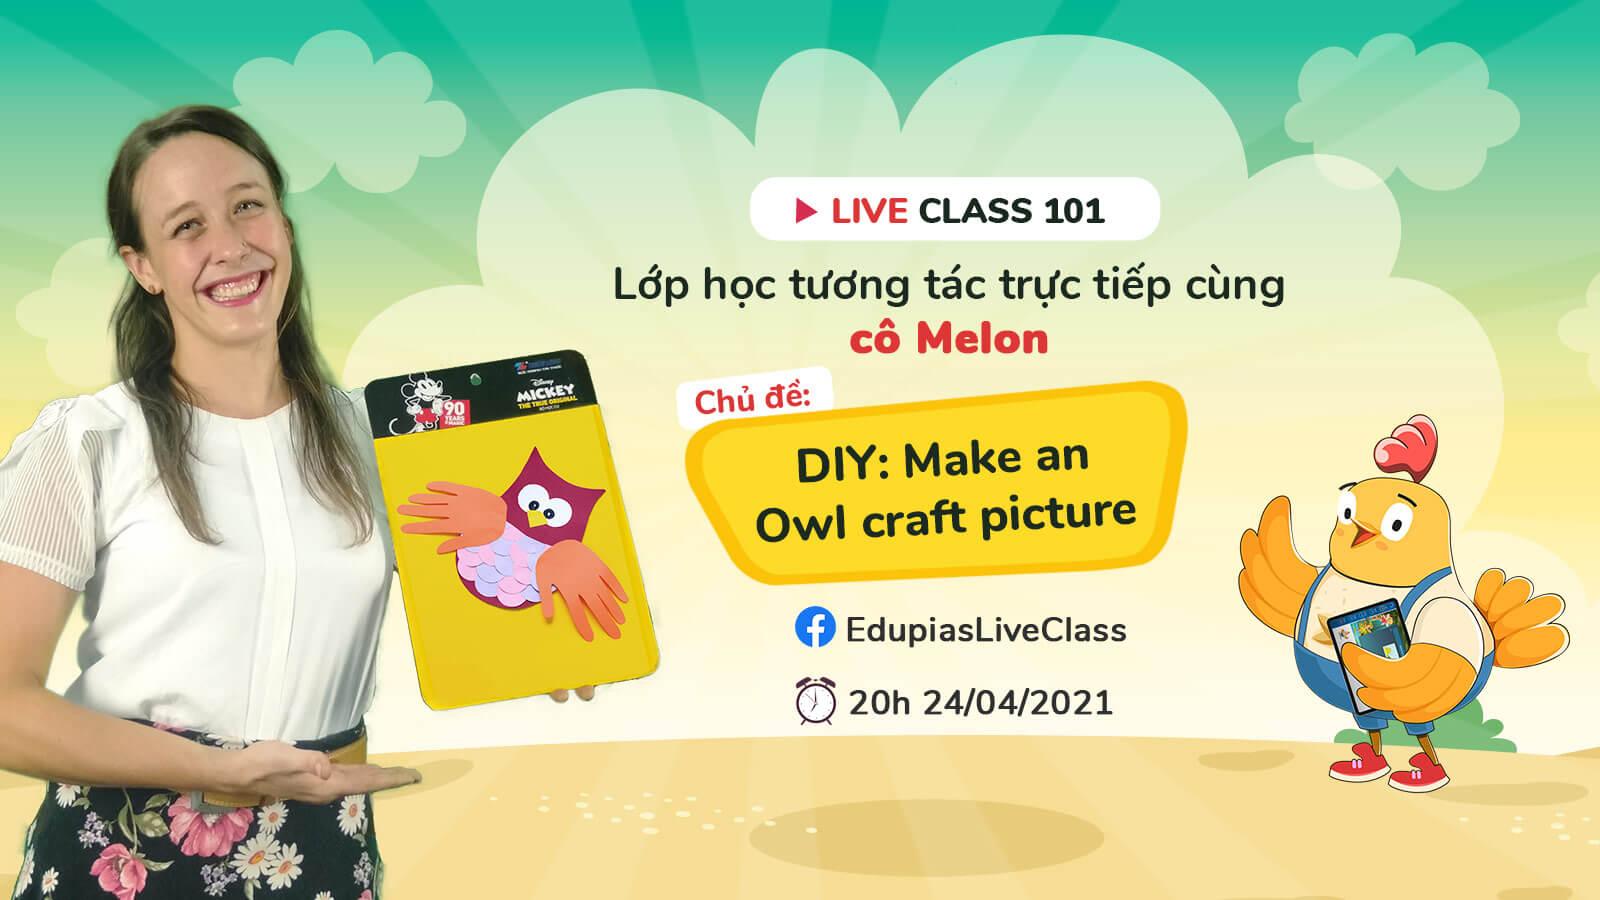 Live class tuần 101 - Chủ đề: DIY: Make an Owl craft picture